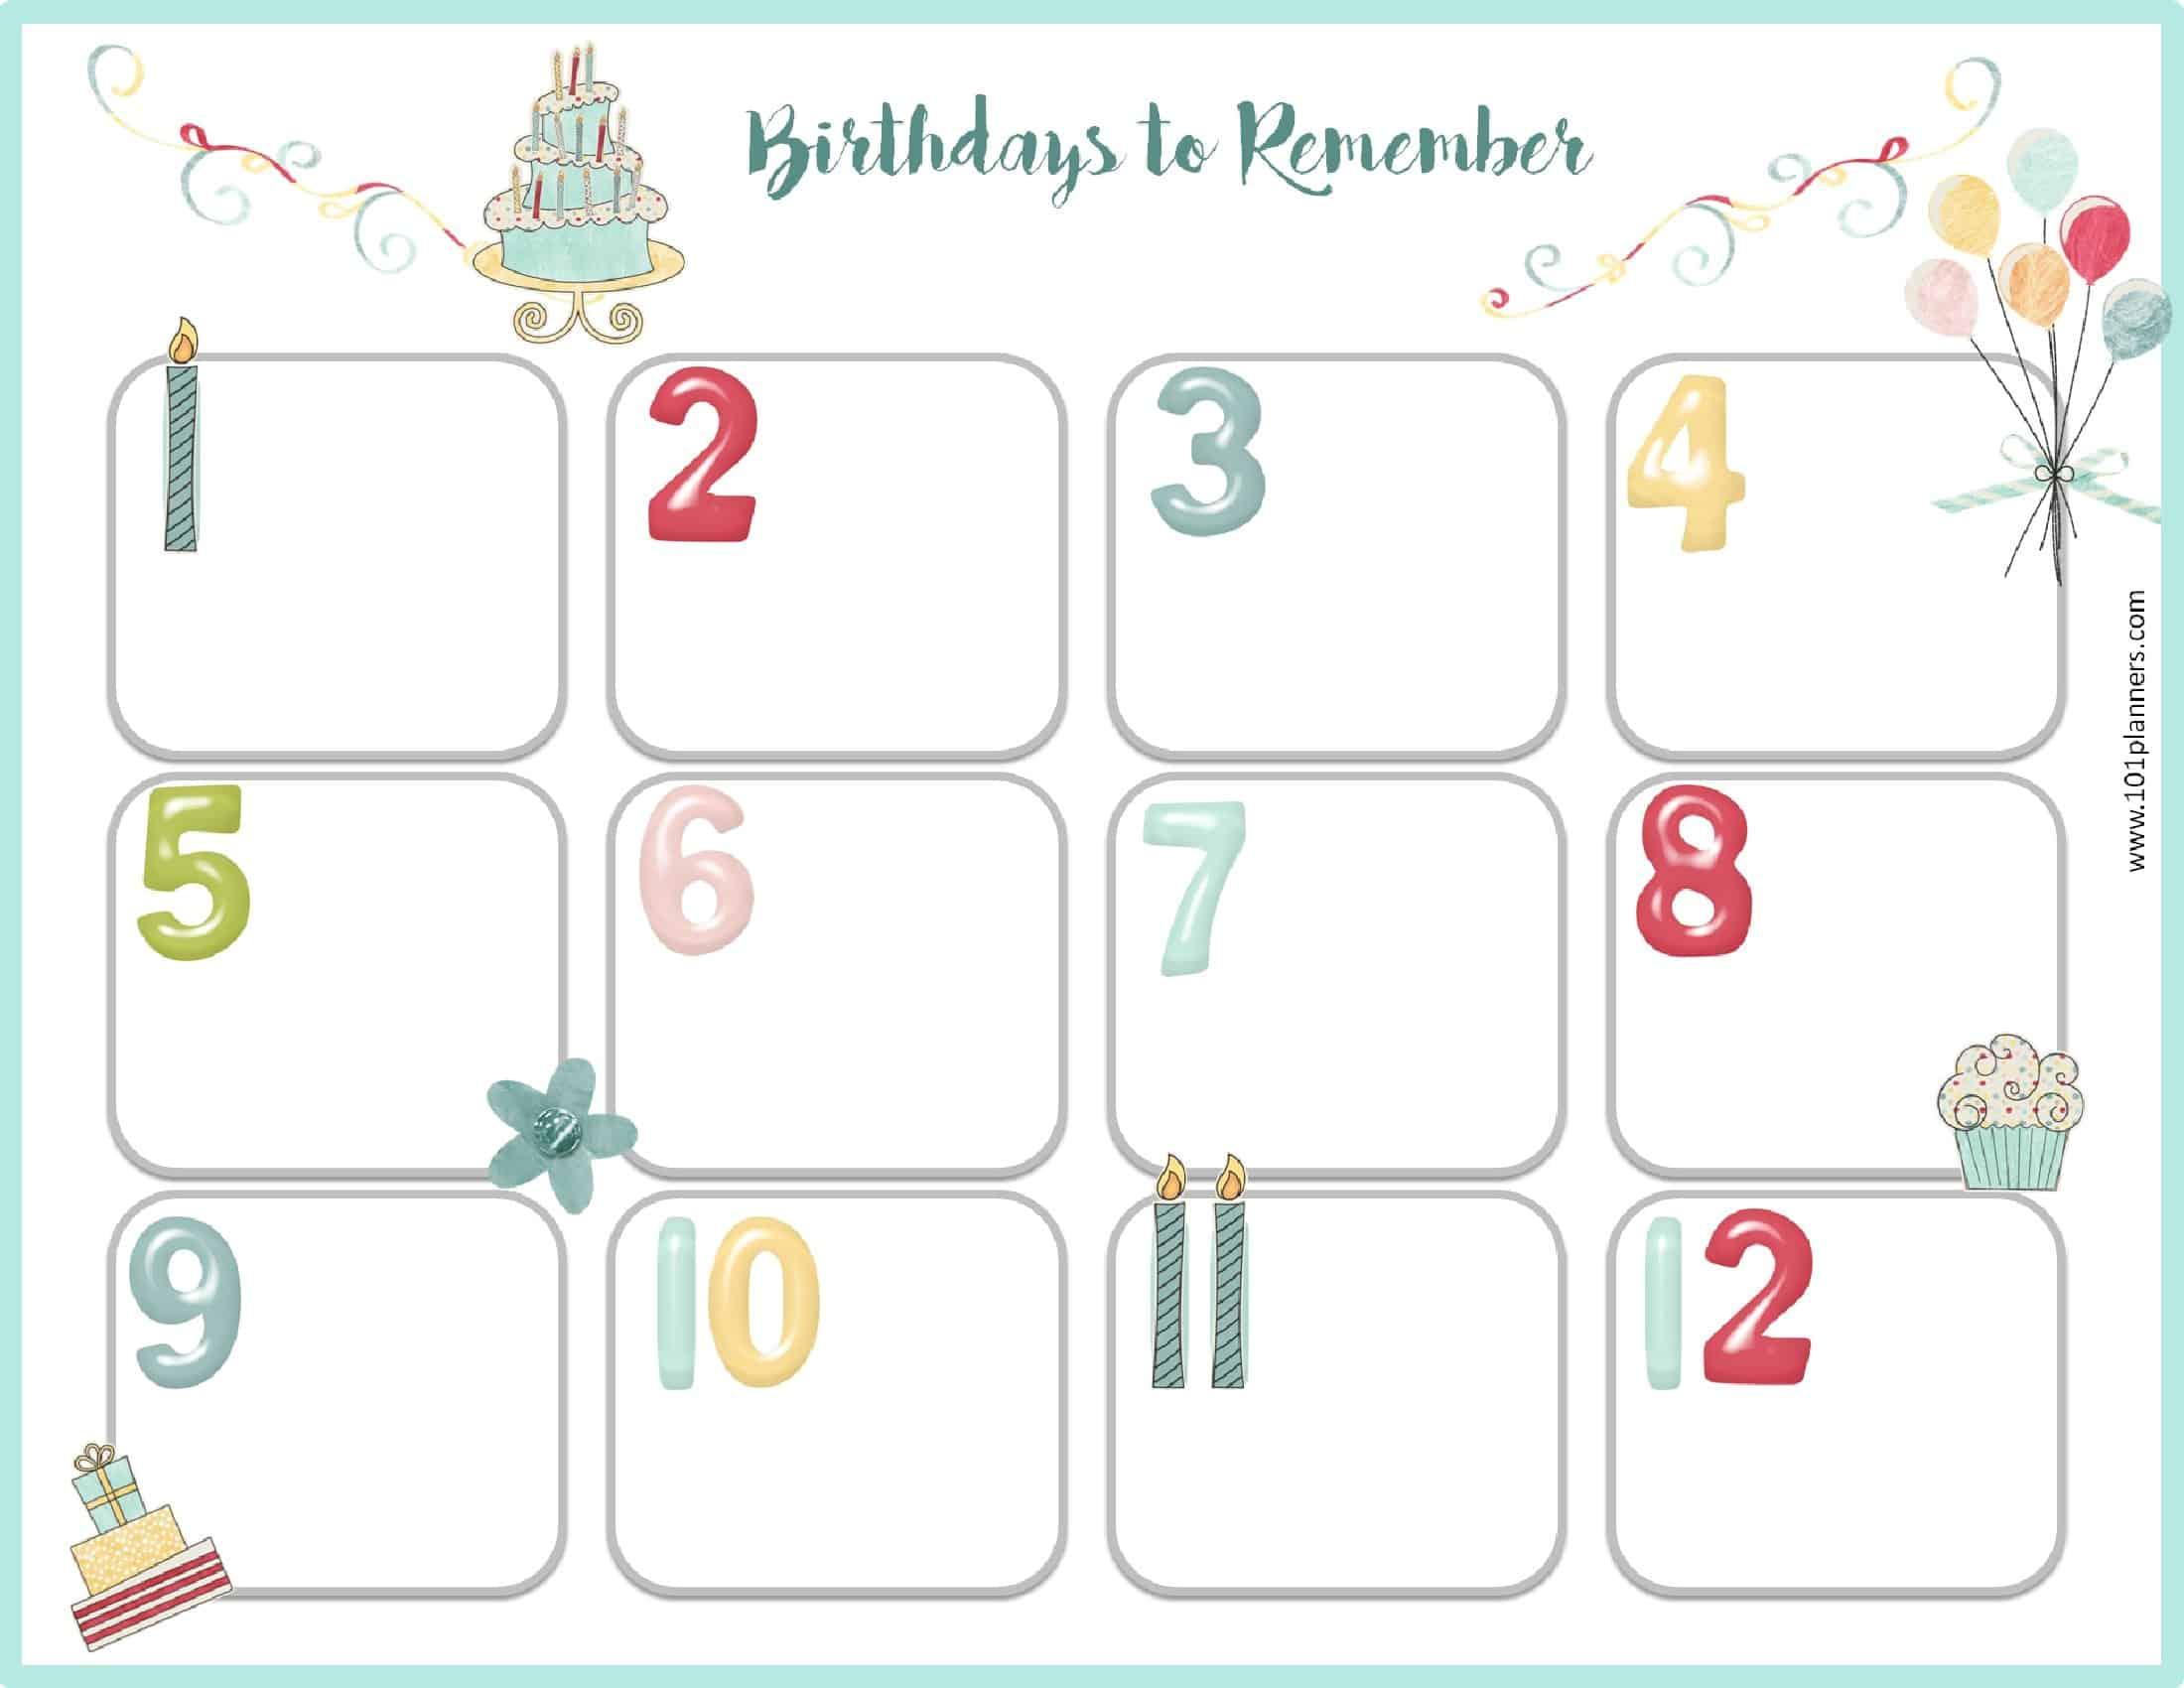 Free Birthday Calendar   Printable & Customizable   Many Designs! within Monthly Birthday Calendar Template